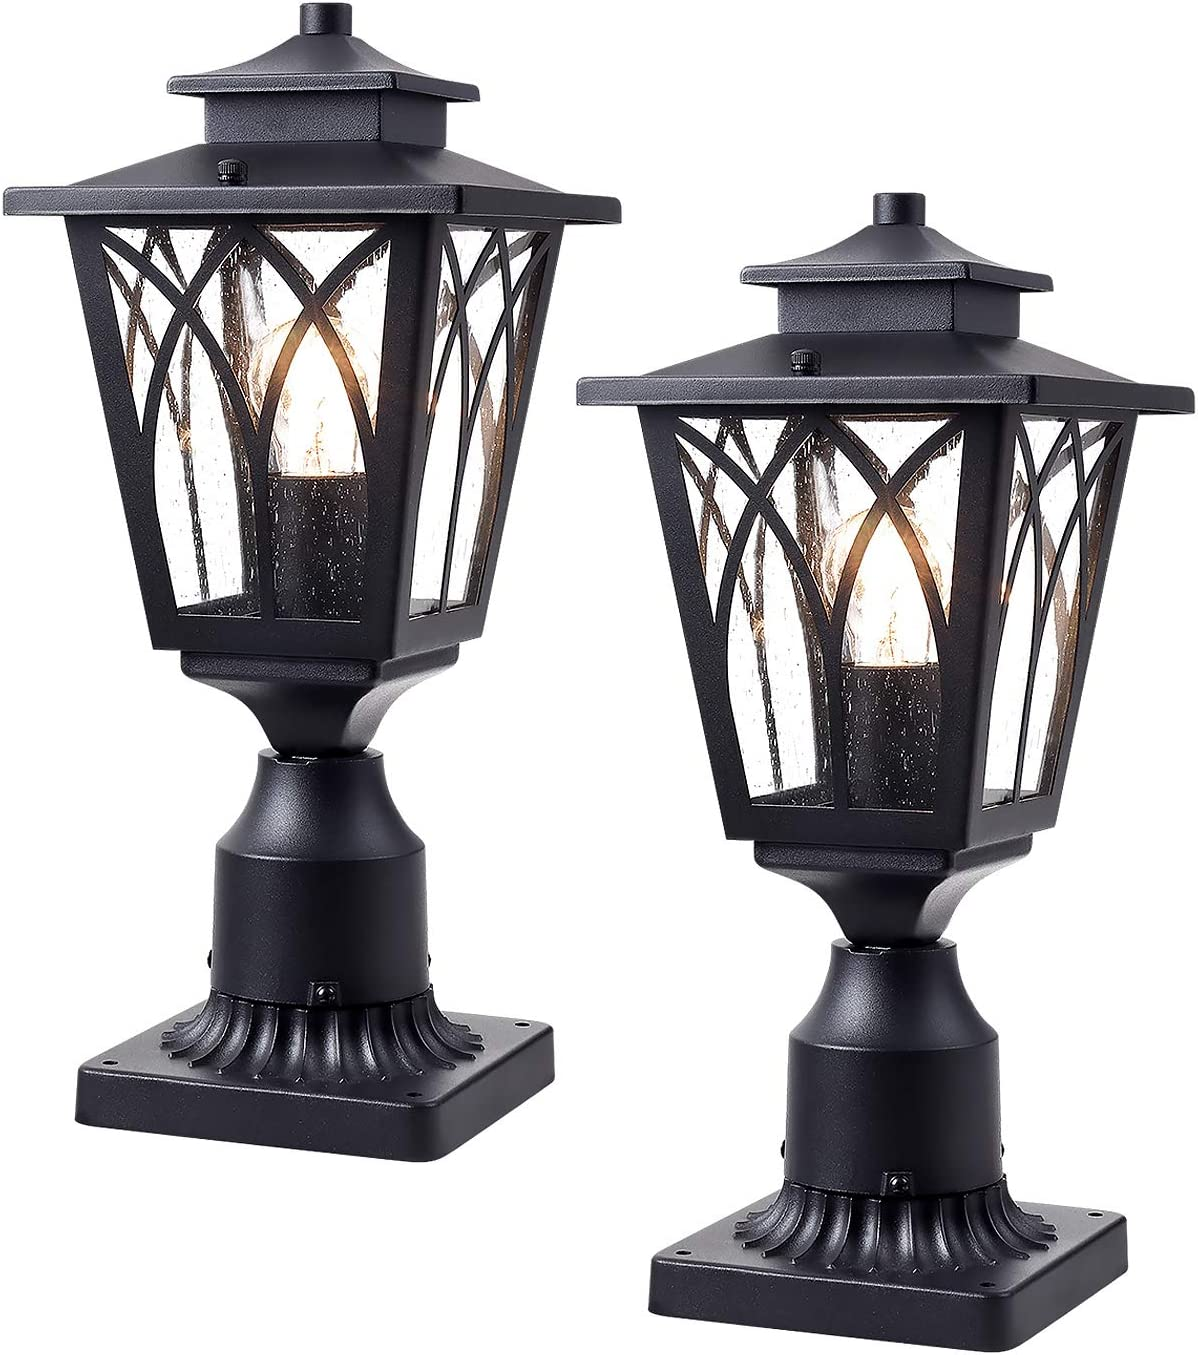 JAZAVA Outdoor Post Max 40% OFF Light Exterior Fixtures Fashion Tulip Lantern